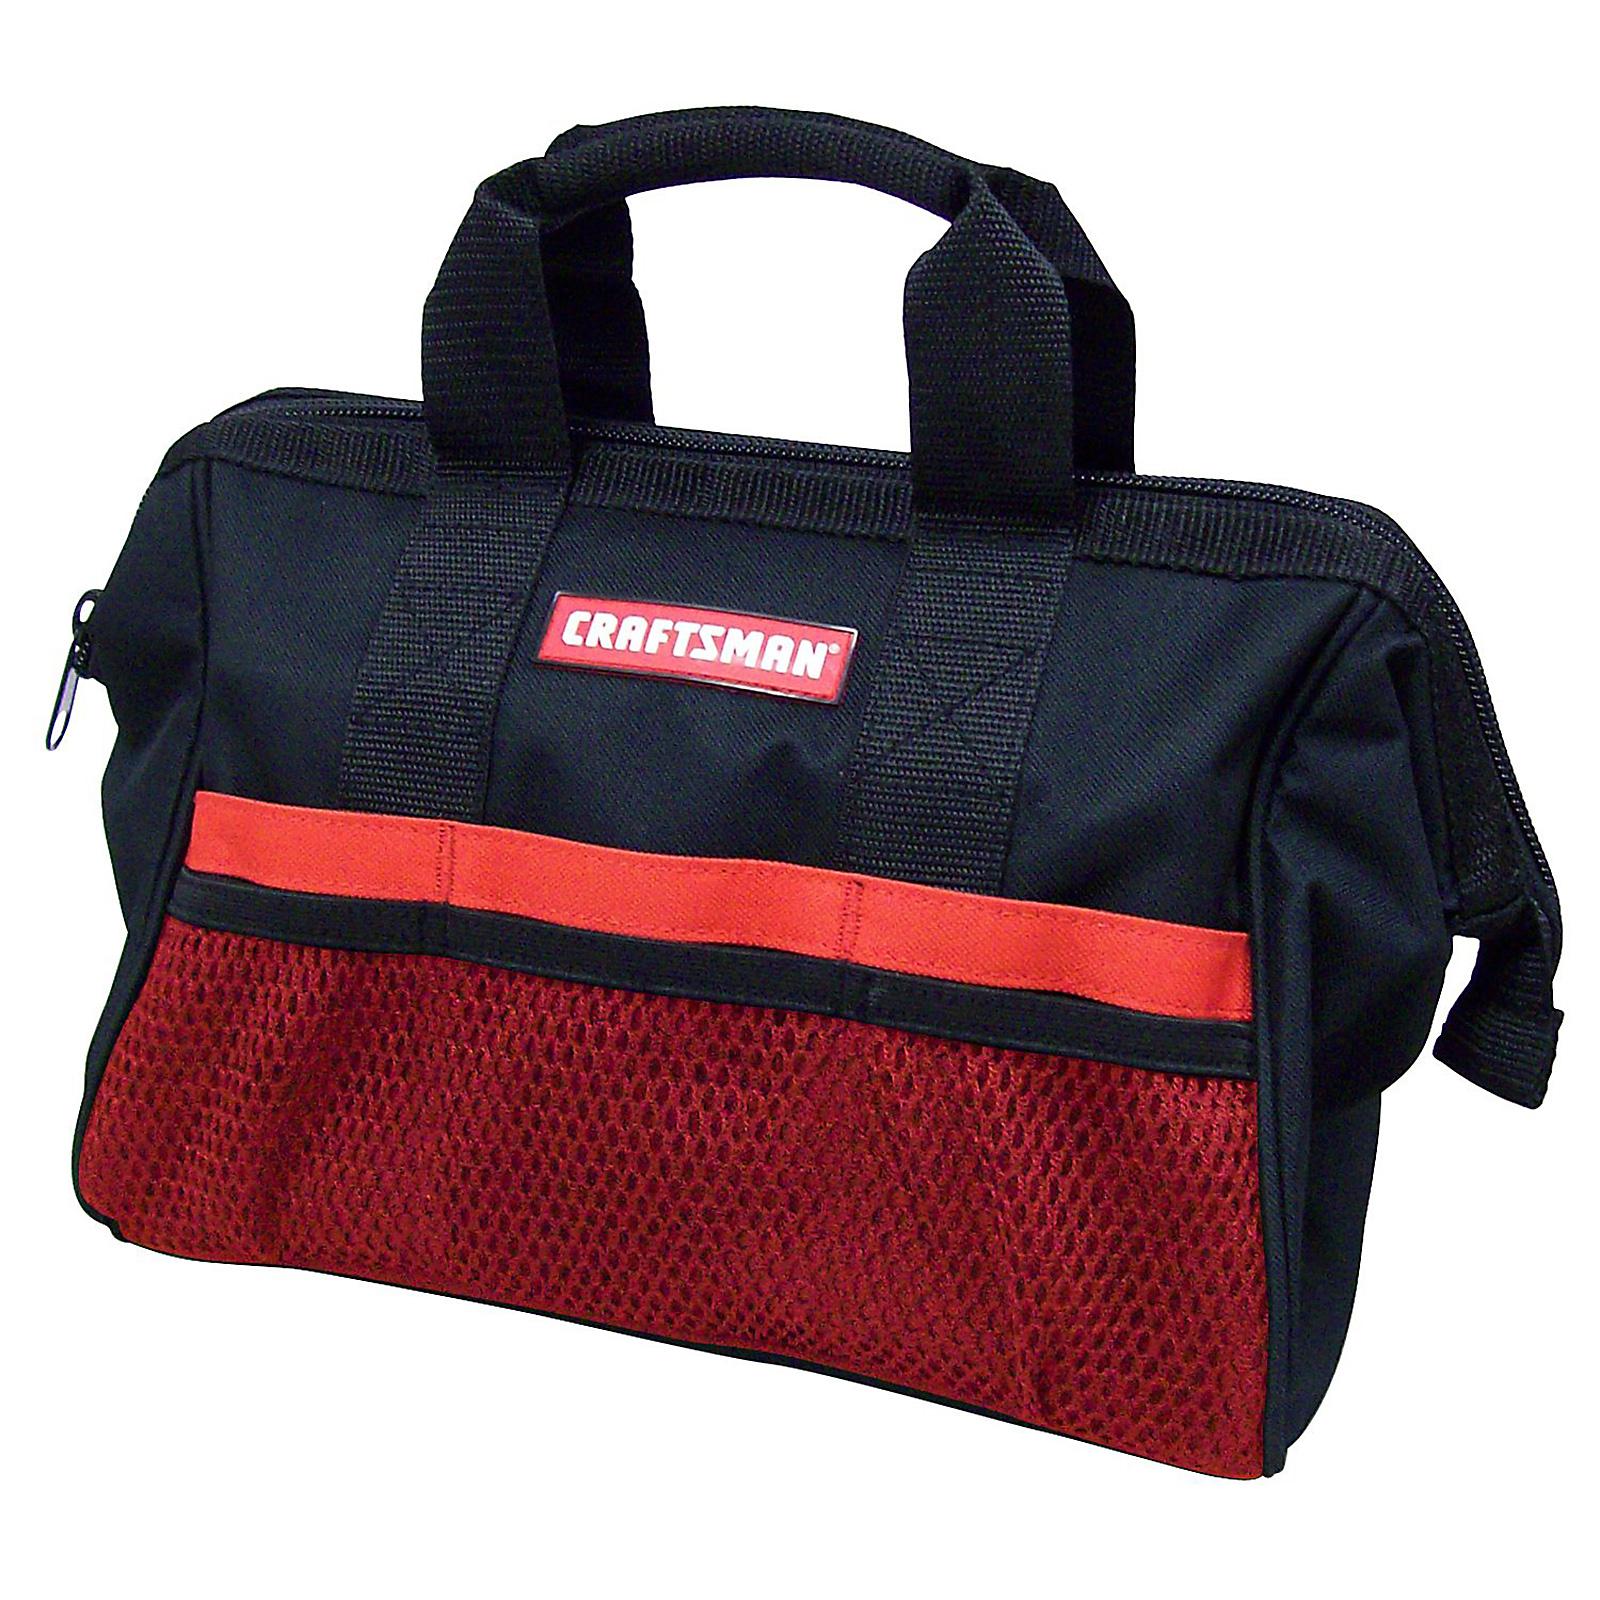 Craftsman 13 in. Tool Bag $3.99 (reg. $9.99) @ Sears